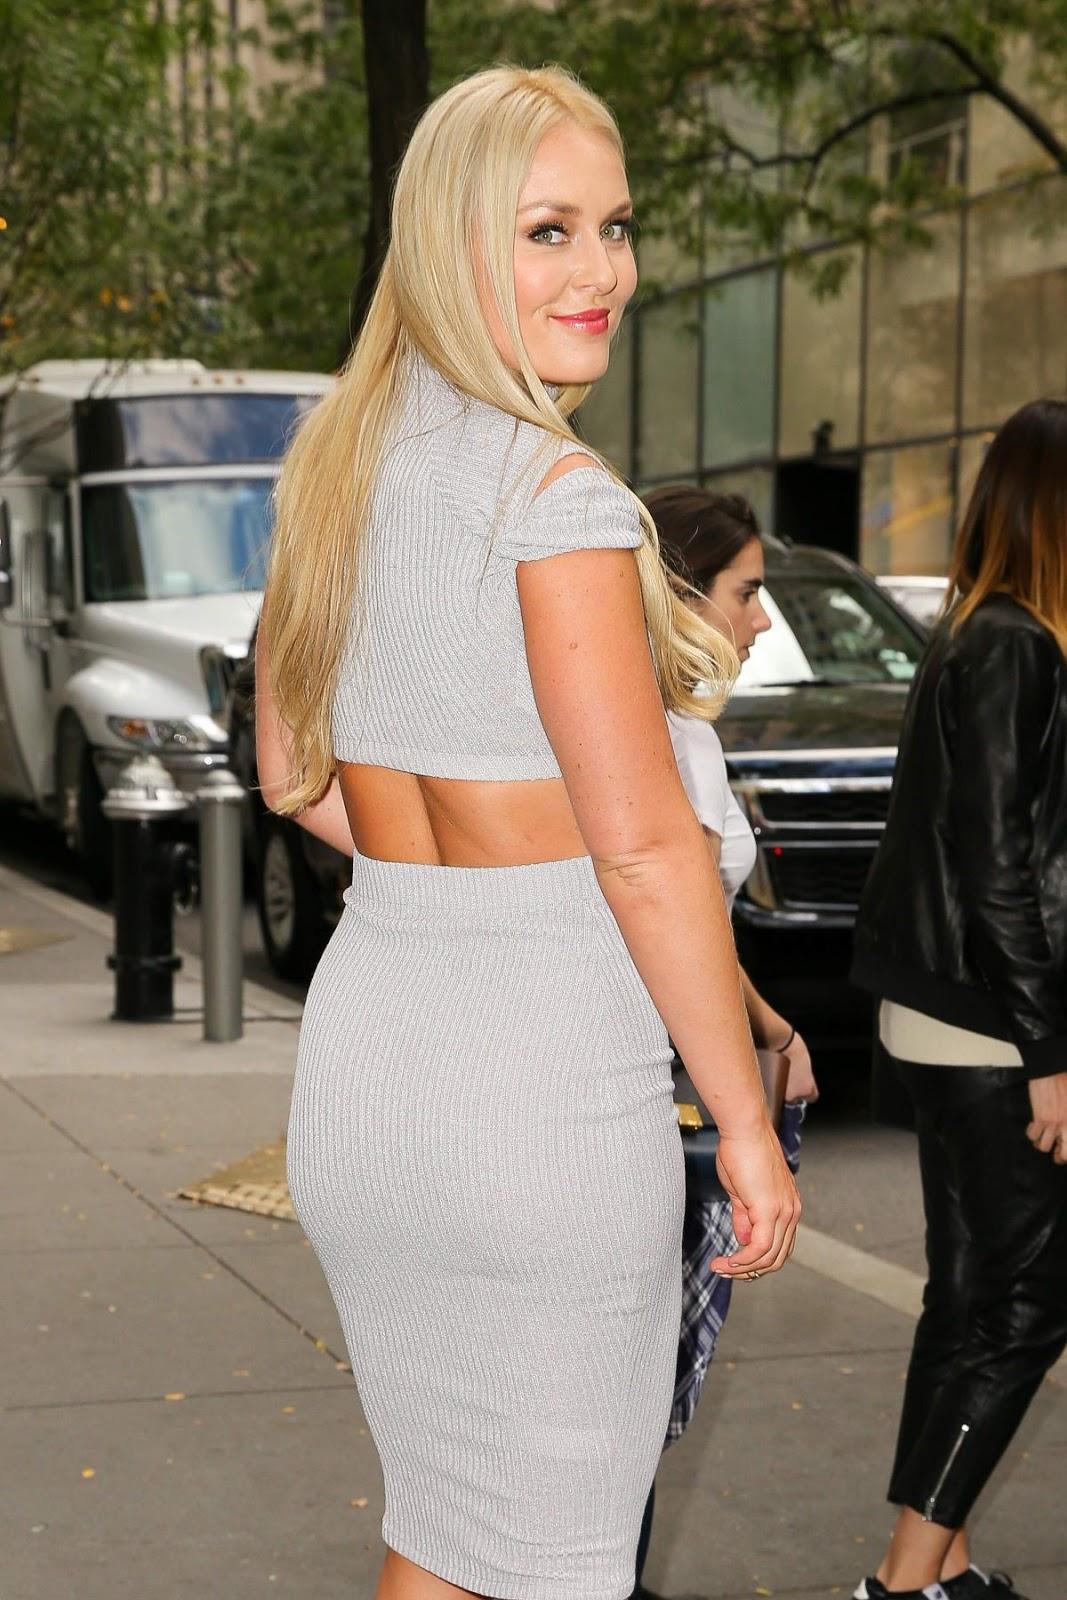 Lindsey Vonn Booty in Tight Dress